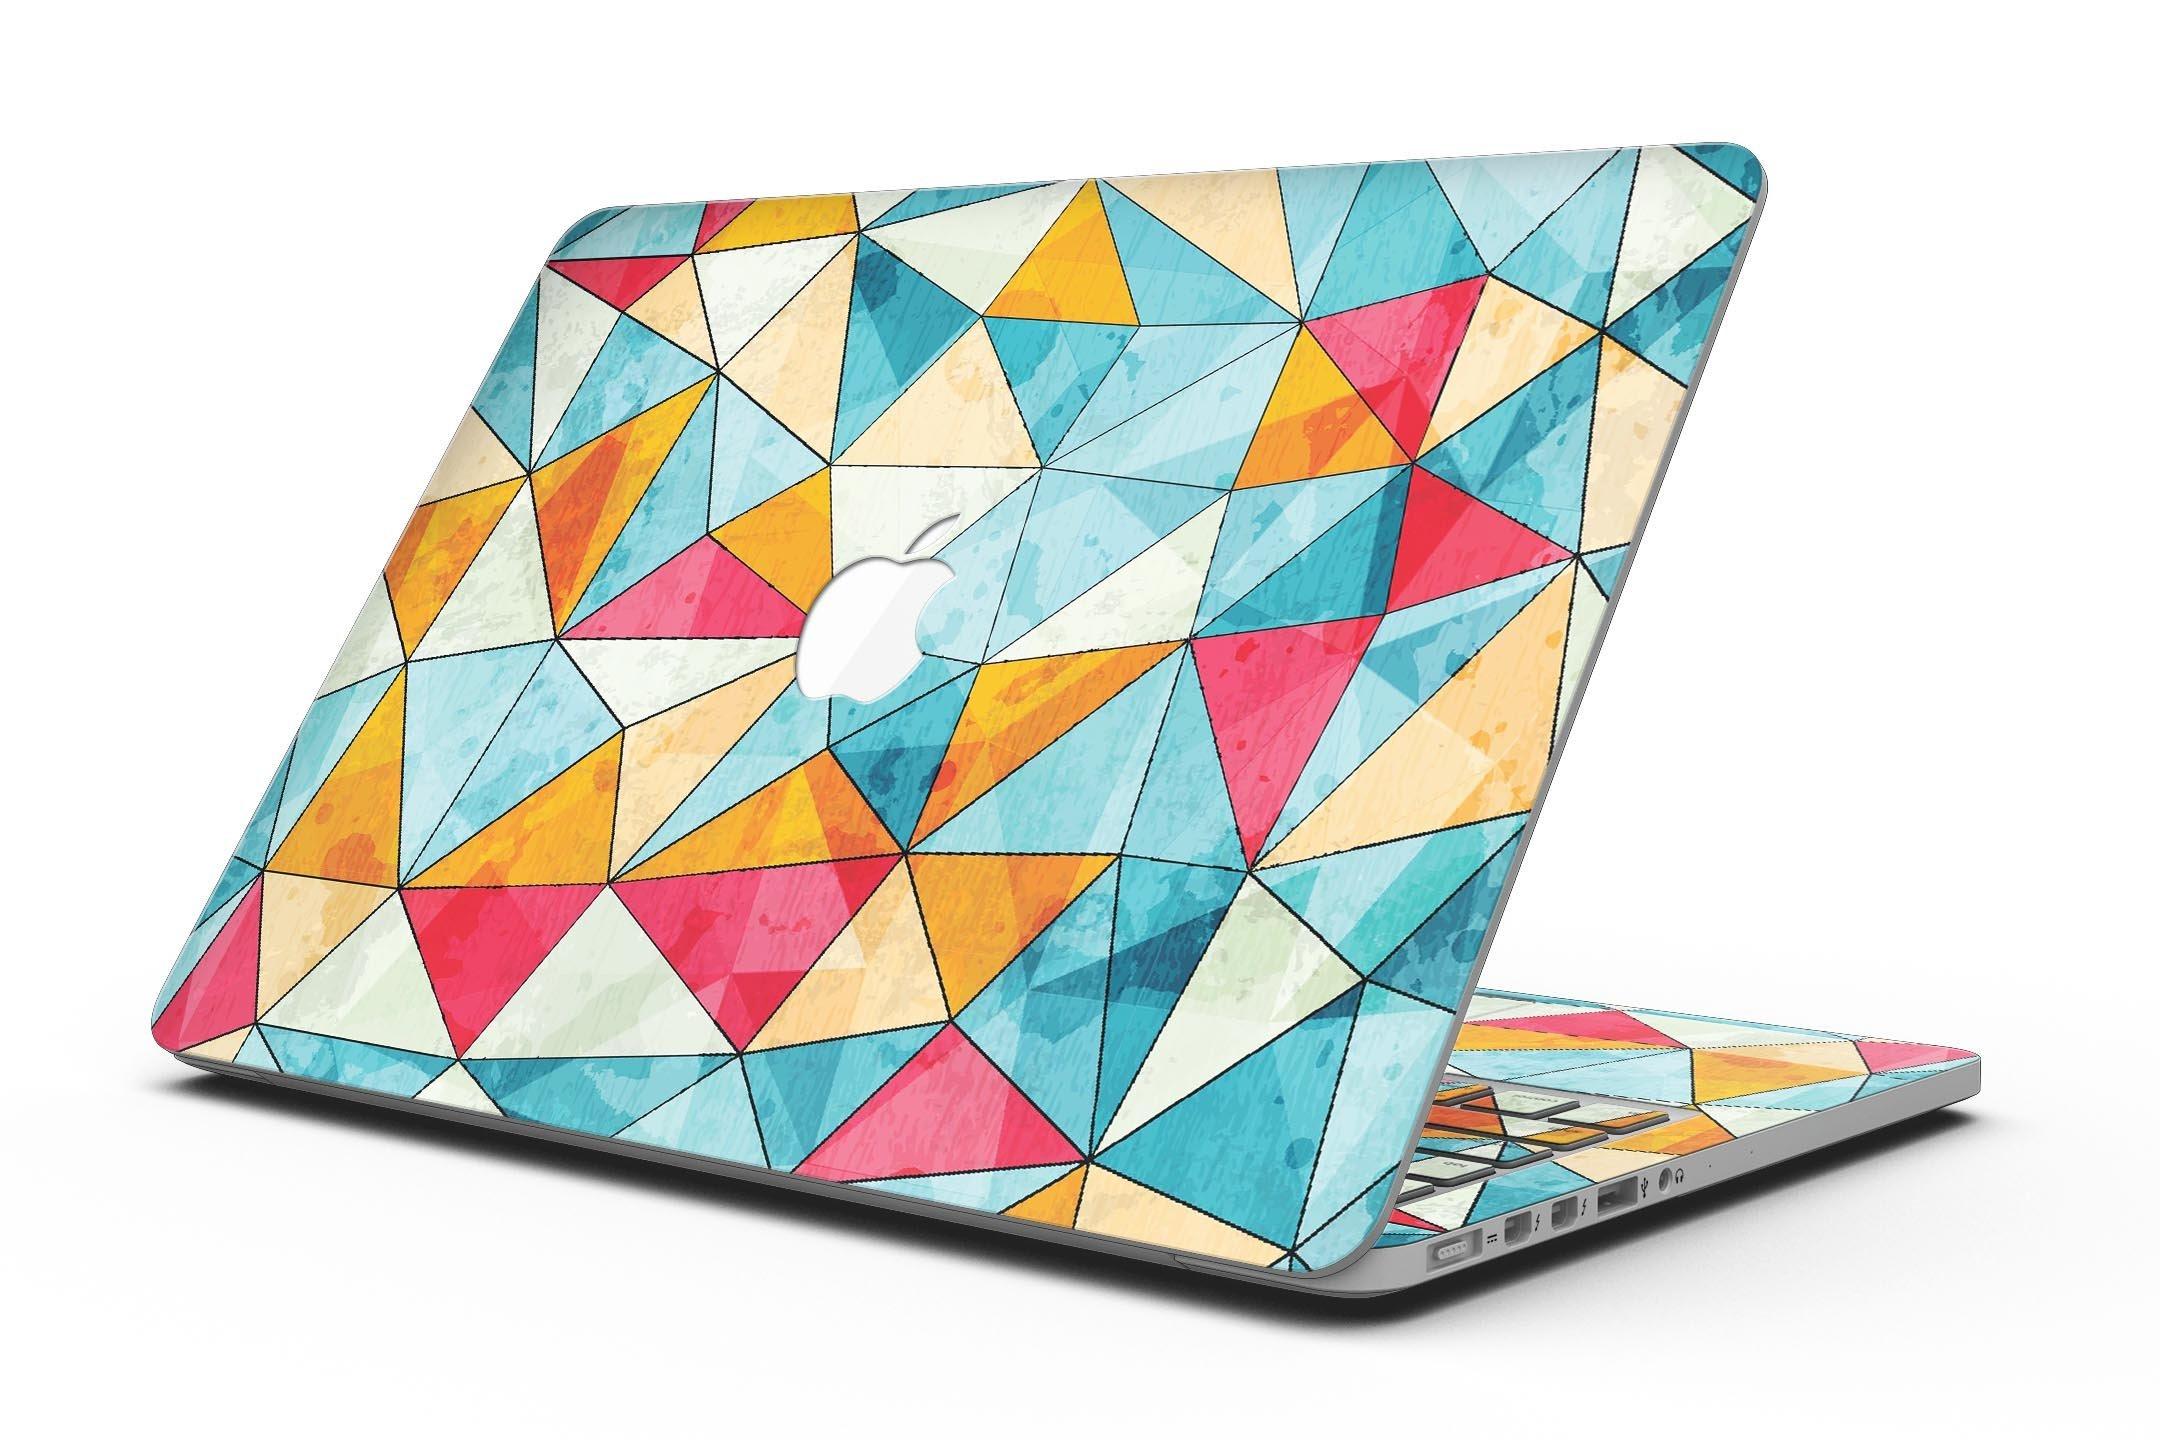 Triangular Geometric Pattern - MacBook Pro with Retina Display Full-Coverage Skin Kit